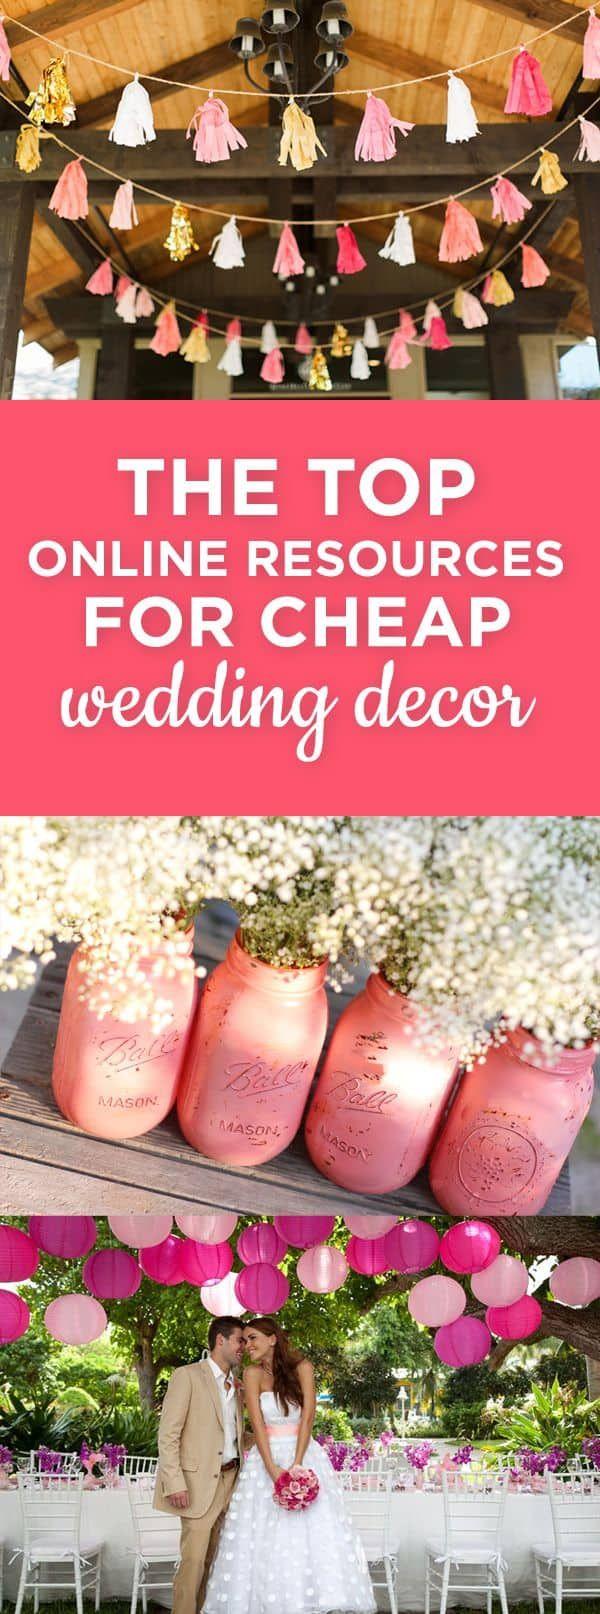 cheap diy wedding best photos   Pinterest   DIY wedding, Wedding and ...